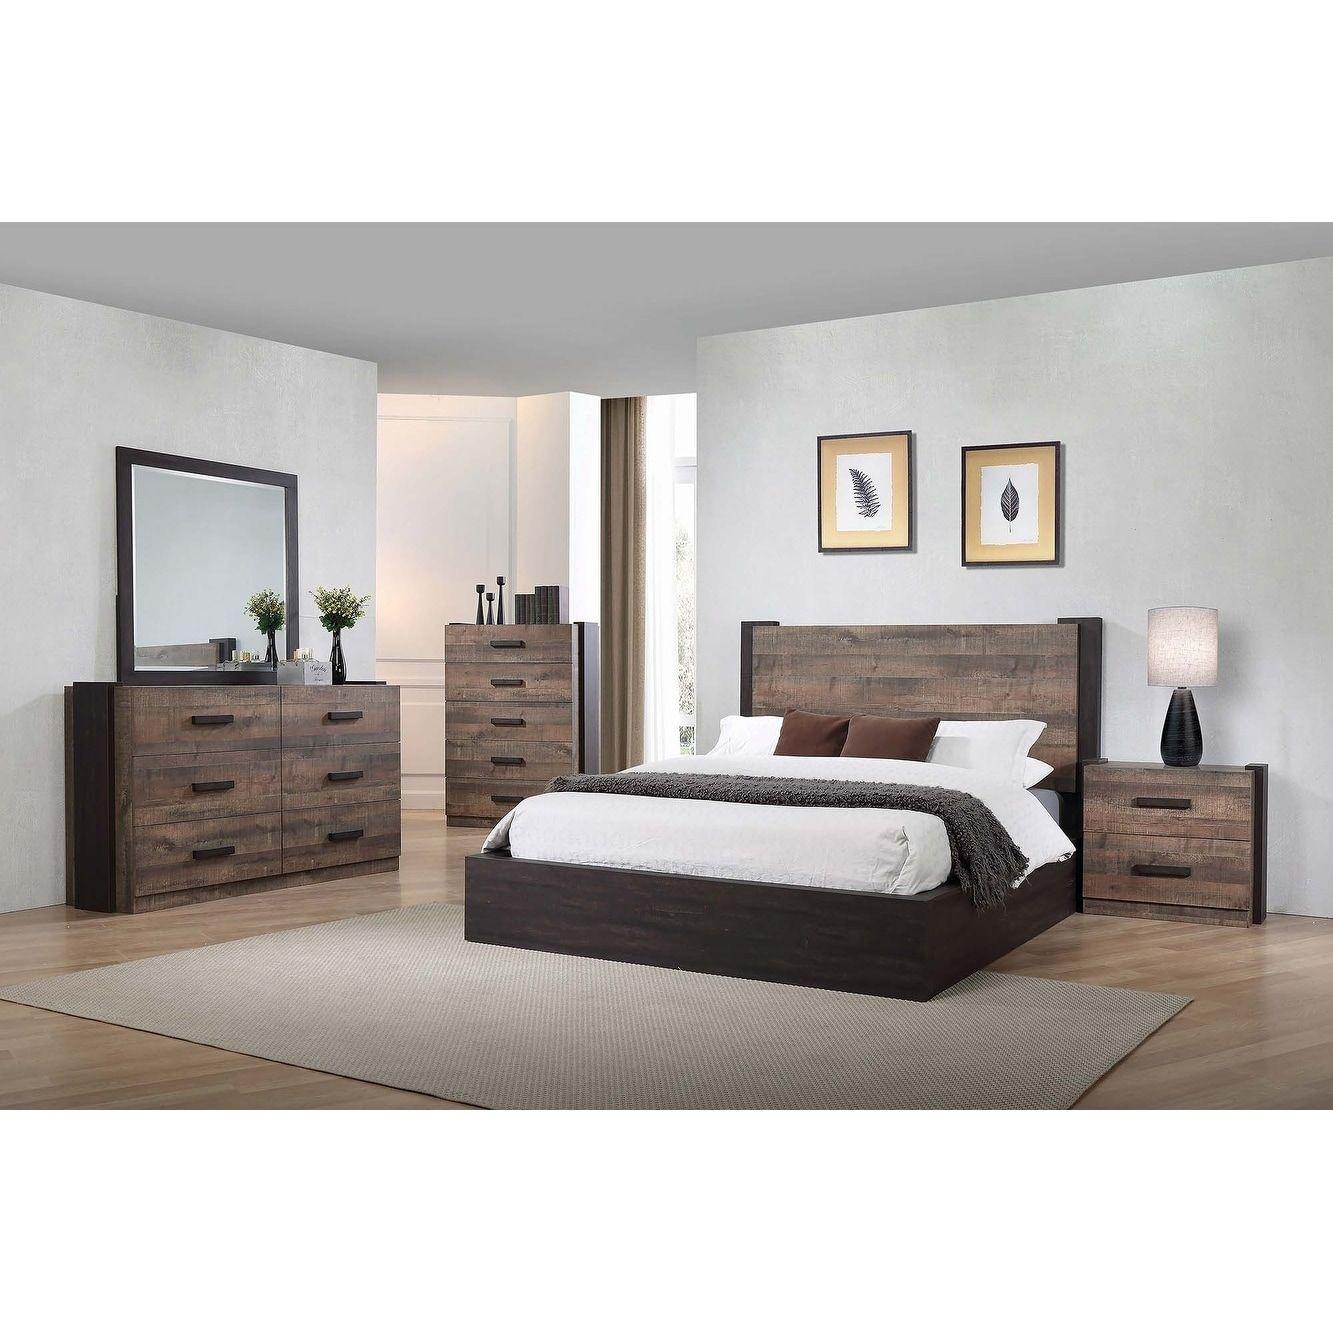 Weston Weathered Oak And Rustic Coffee 6 Drawer Dresser Brown Carbon Loft Bedroom Set Platform Bedroom Sets Bedroom Sets